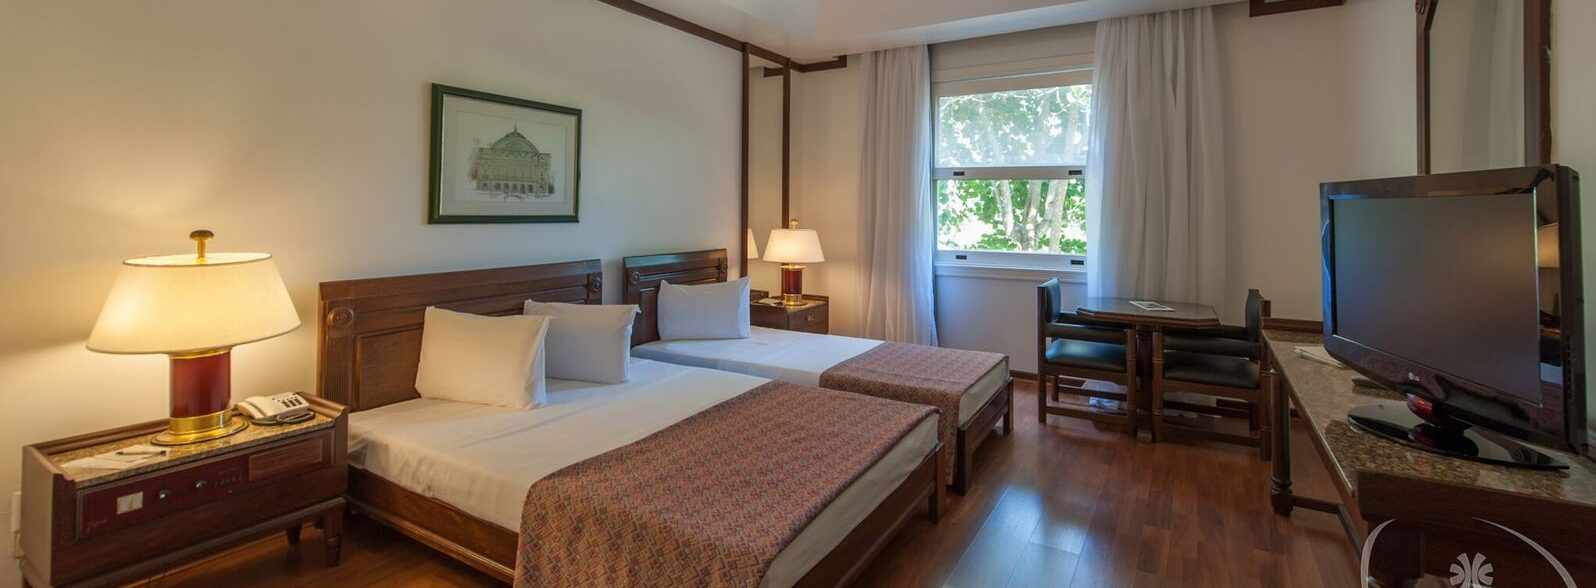 Chambre deux lits Hotel Tropical Manaus